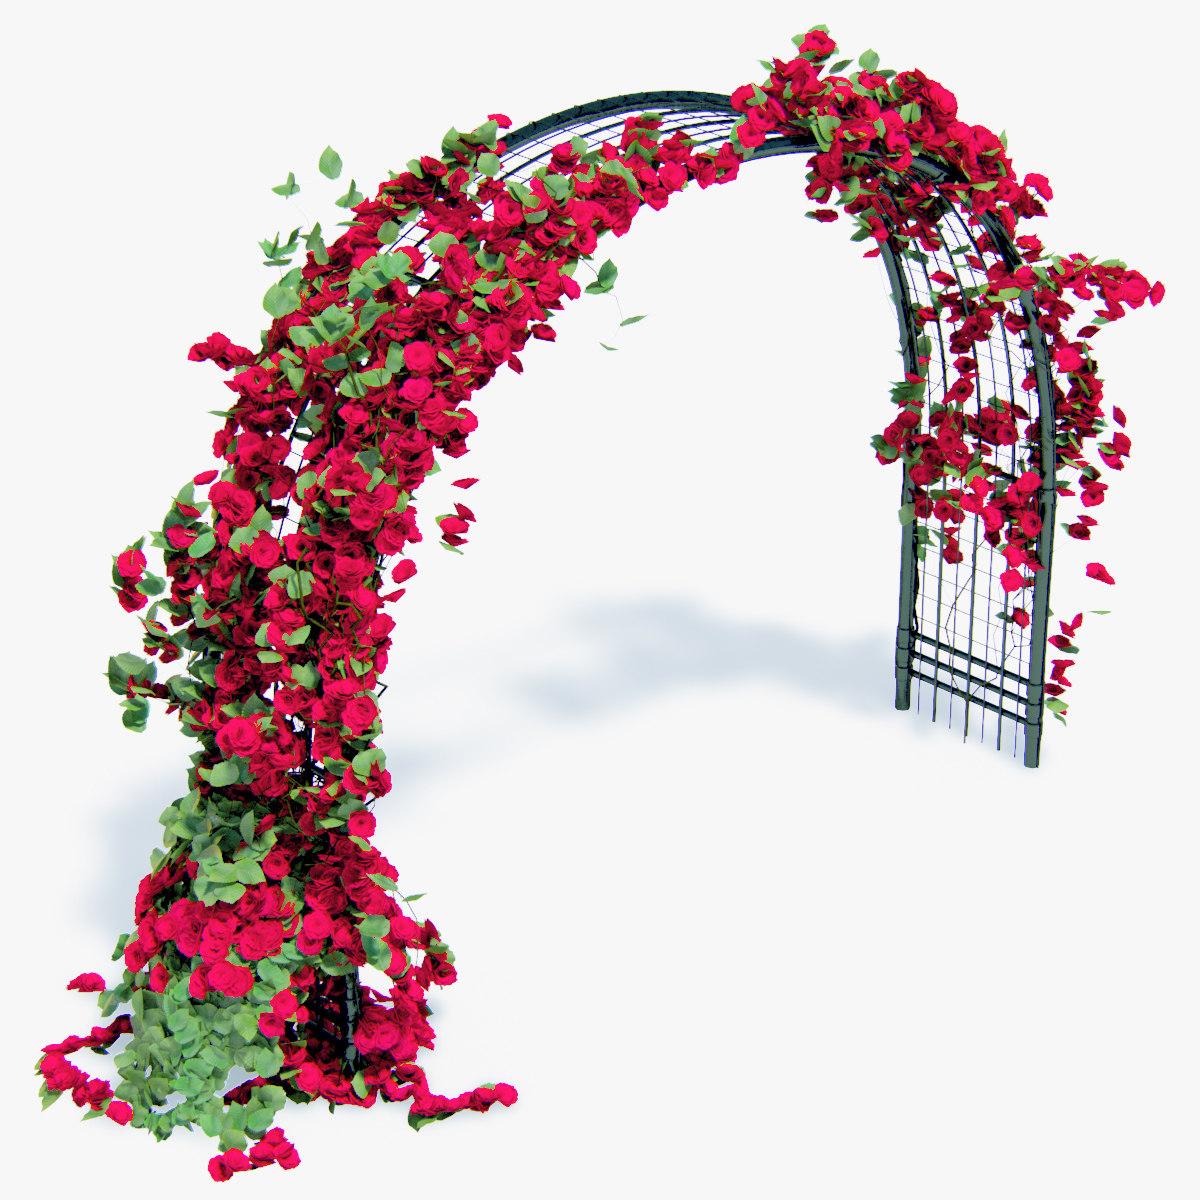 Pergola_With_Flowers_Ivy_00071.jpg